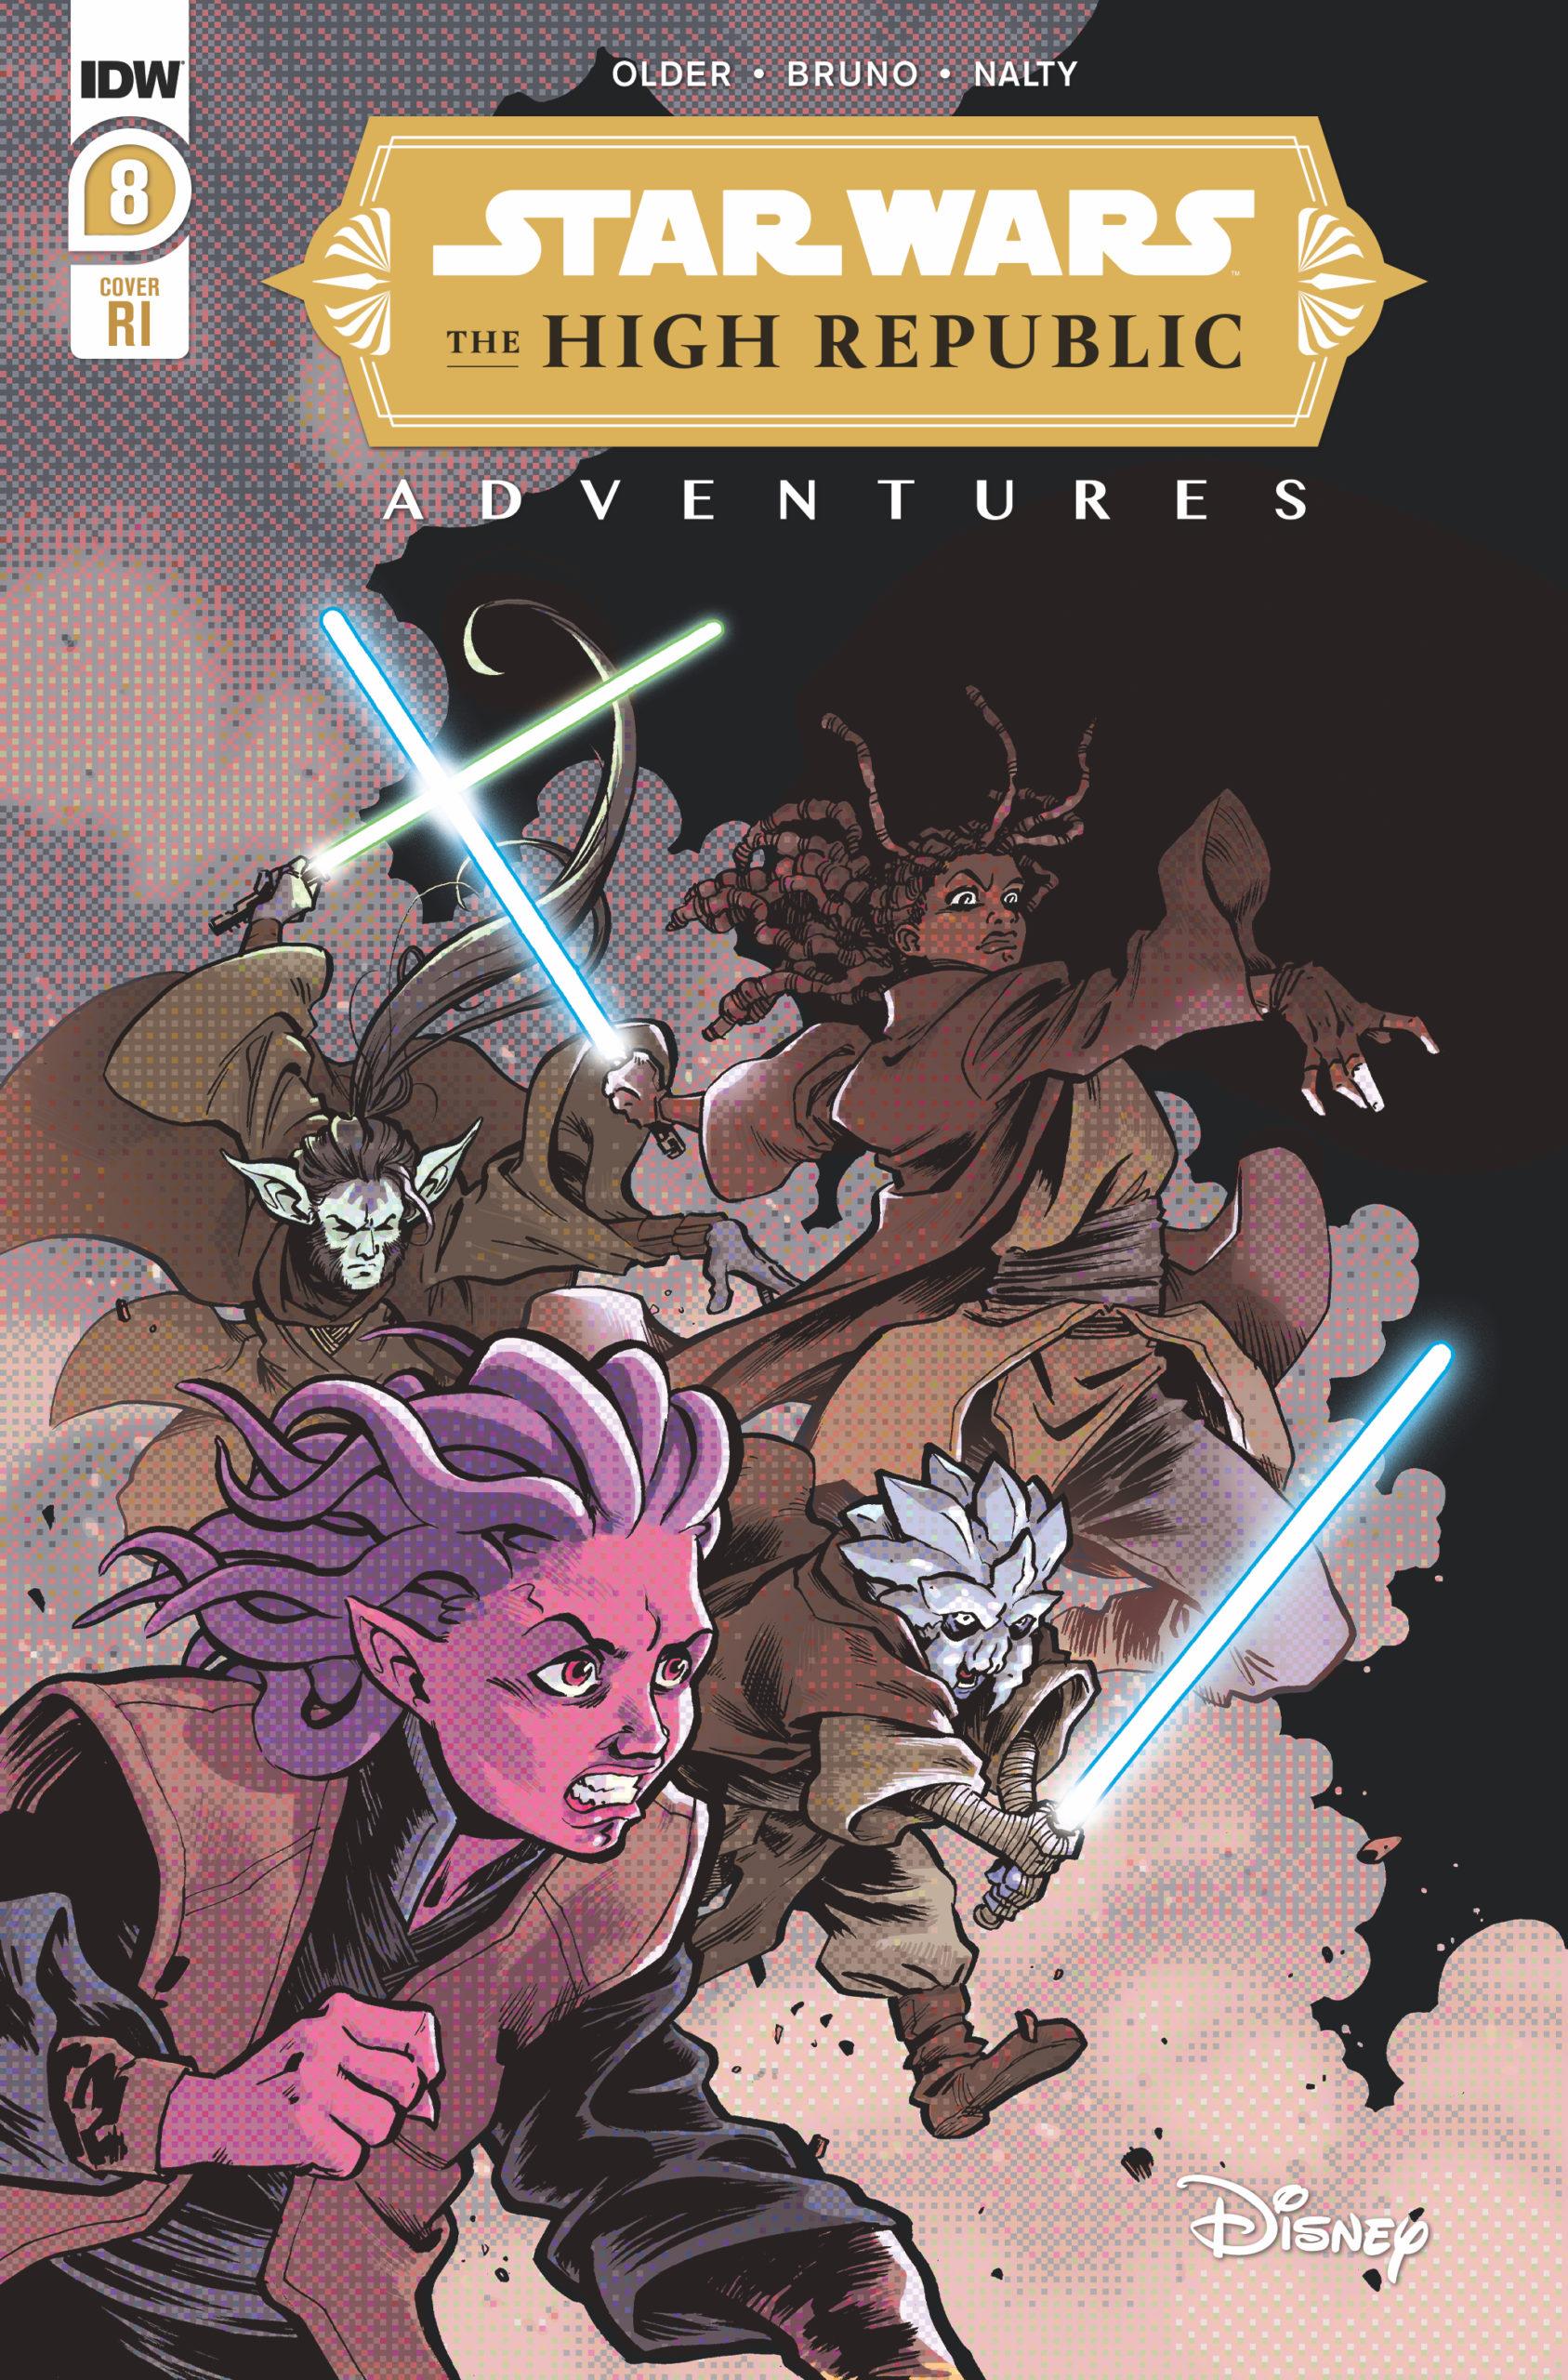 The High Republic Adventures #8 (Ilias Kyriazis Variant Cover) (01.09.2021)